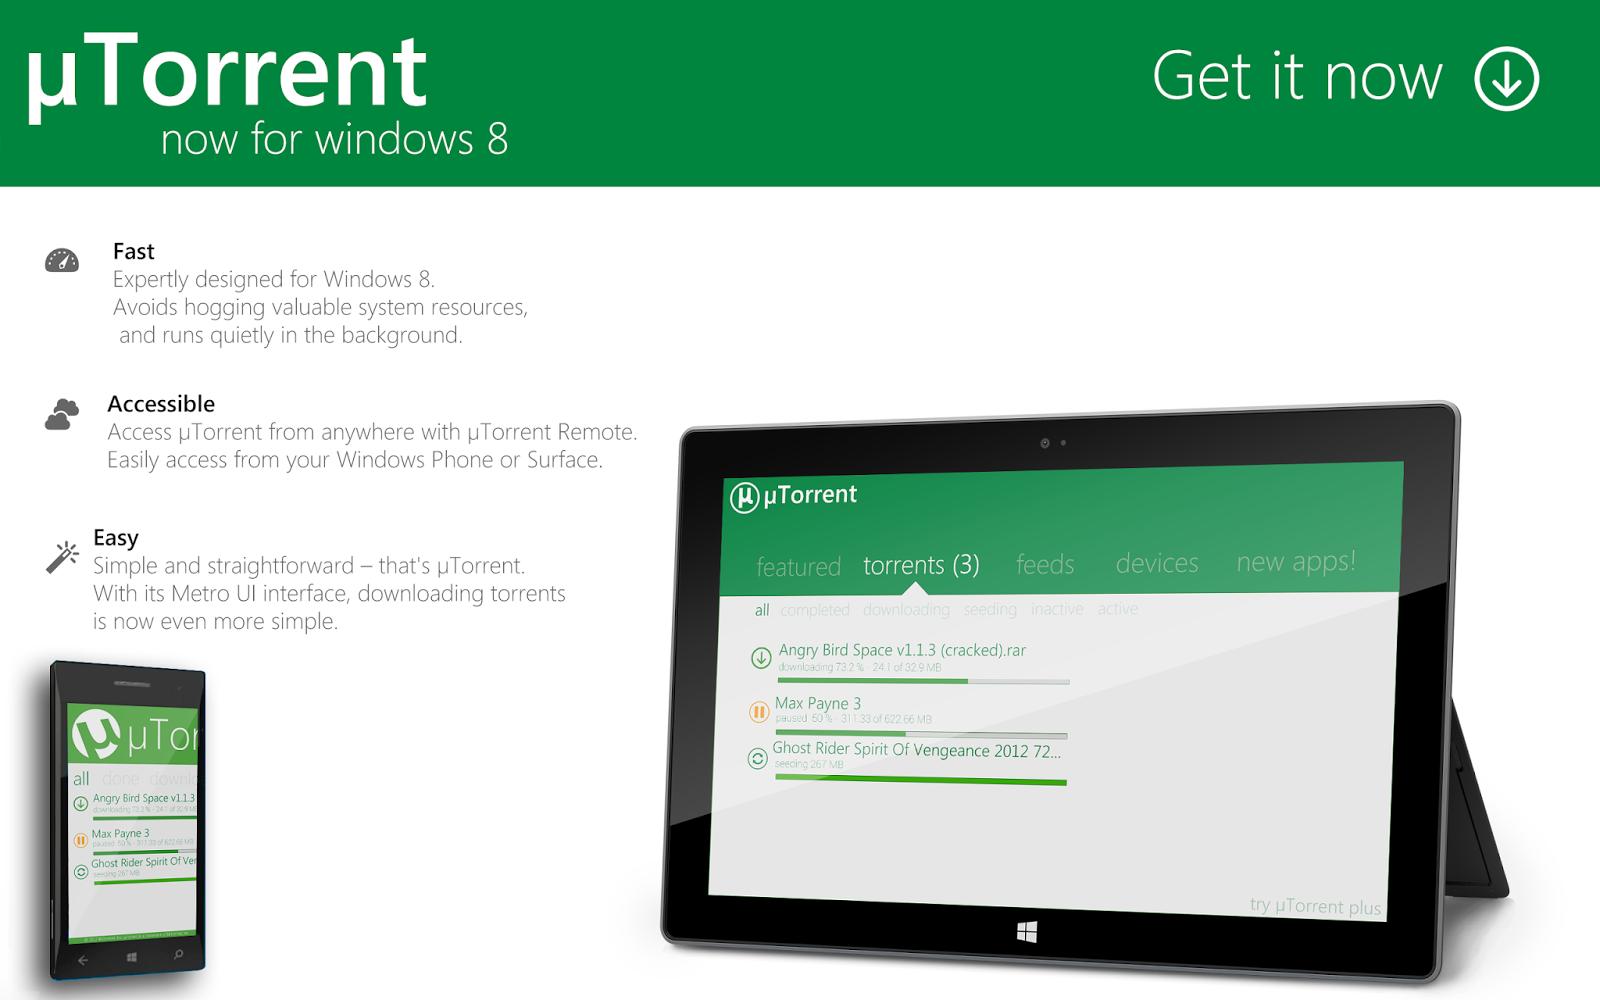 Google Chrome impide las descargas desde uTorrent